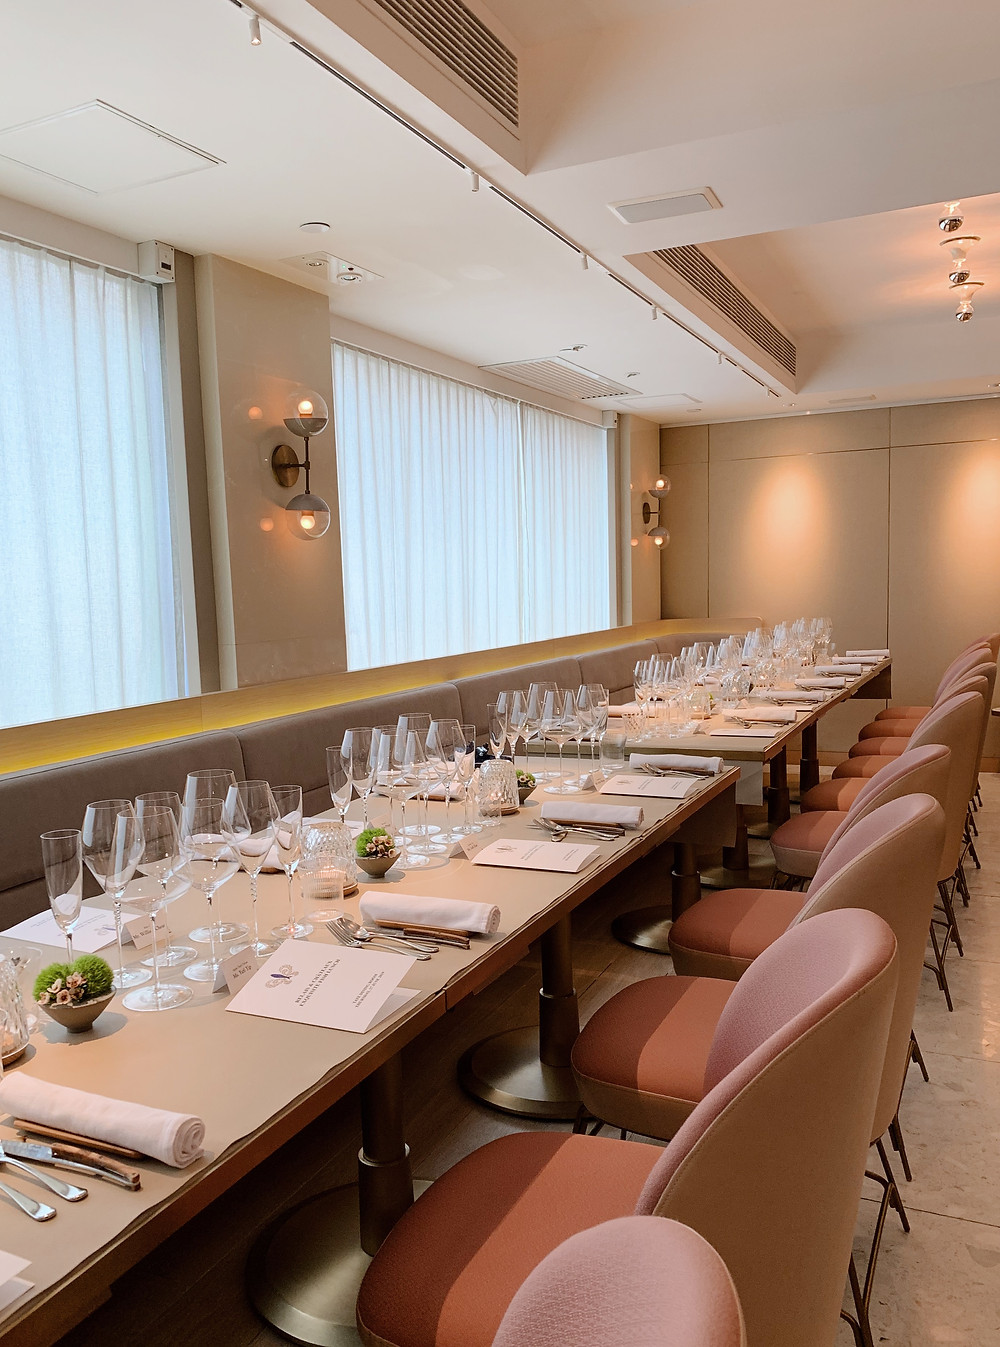 Tate Dining Room in Hong Kong